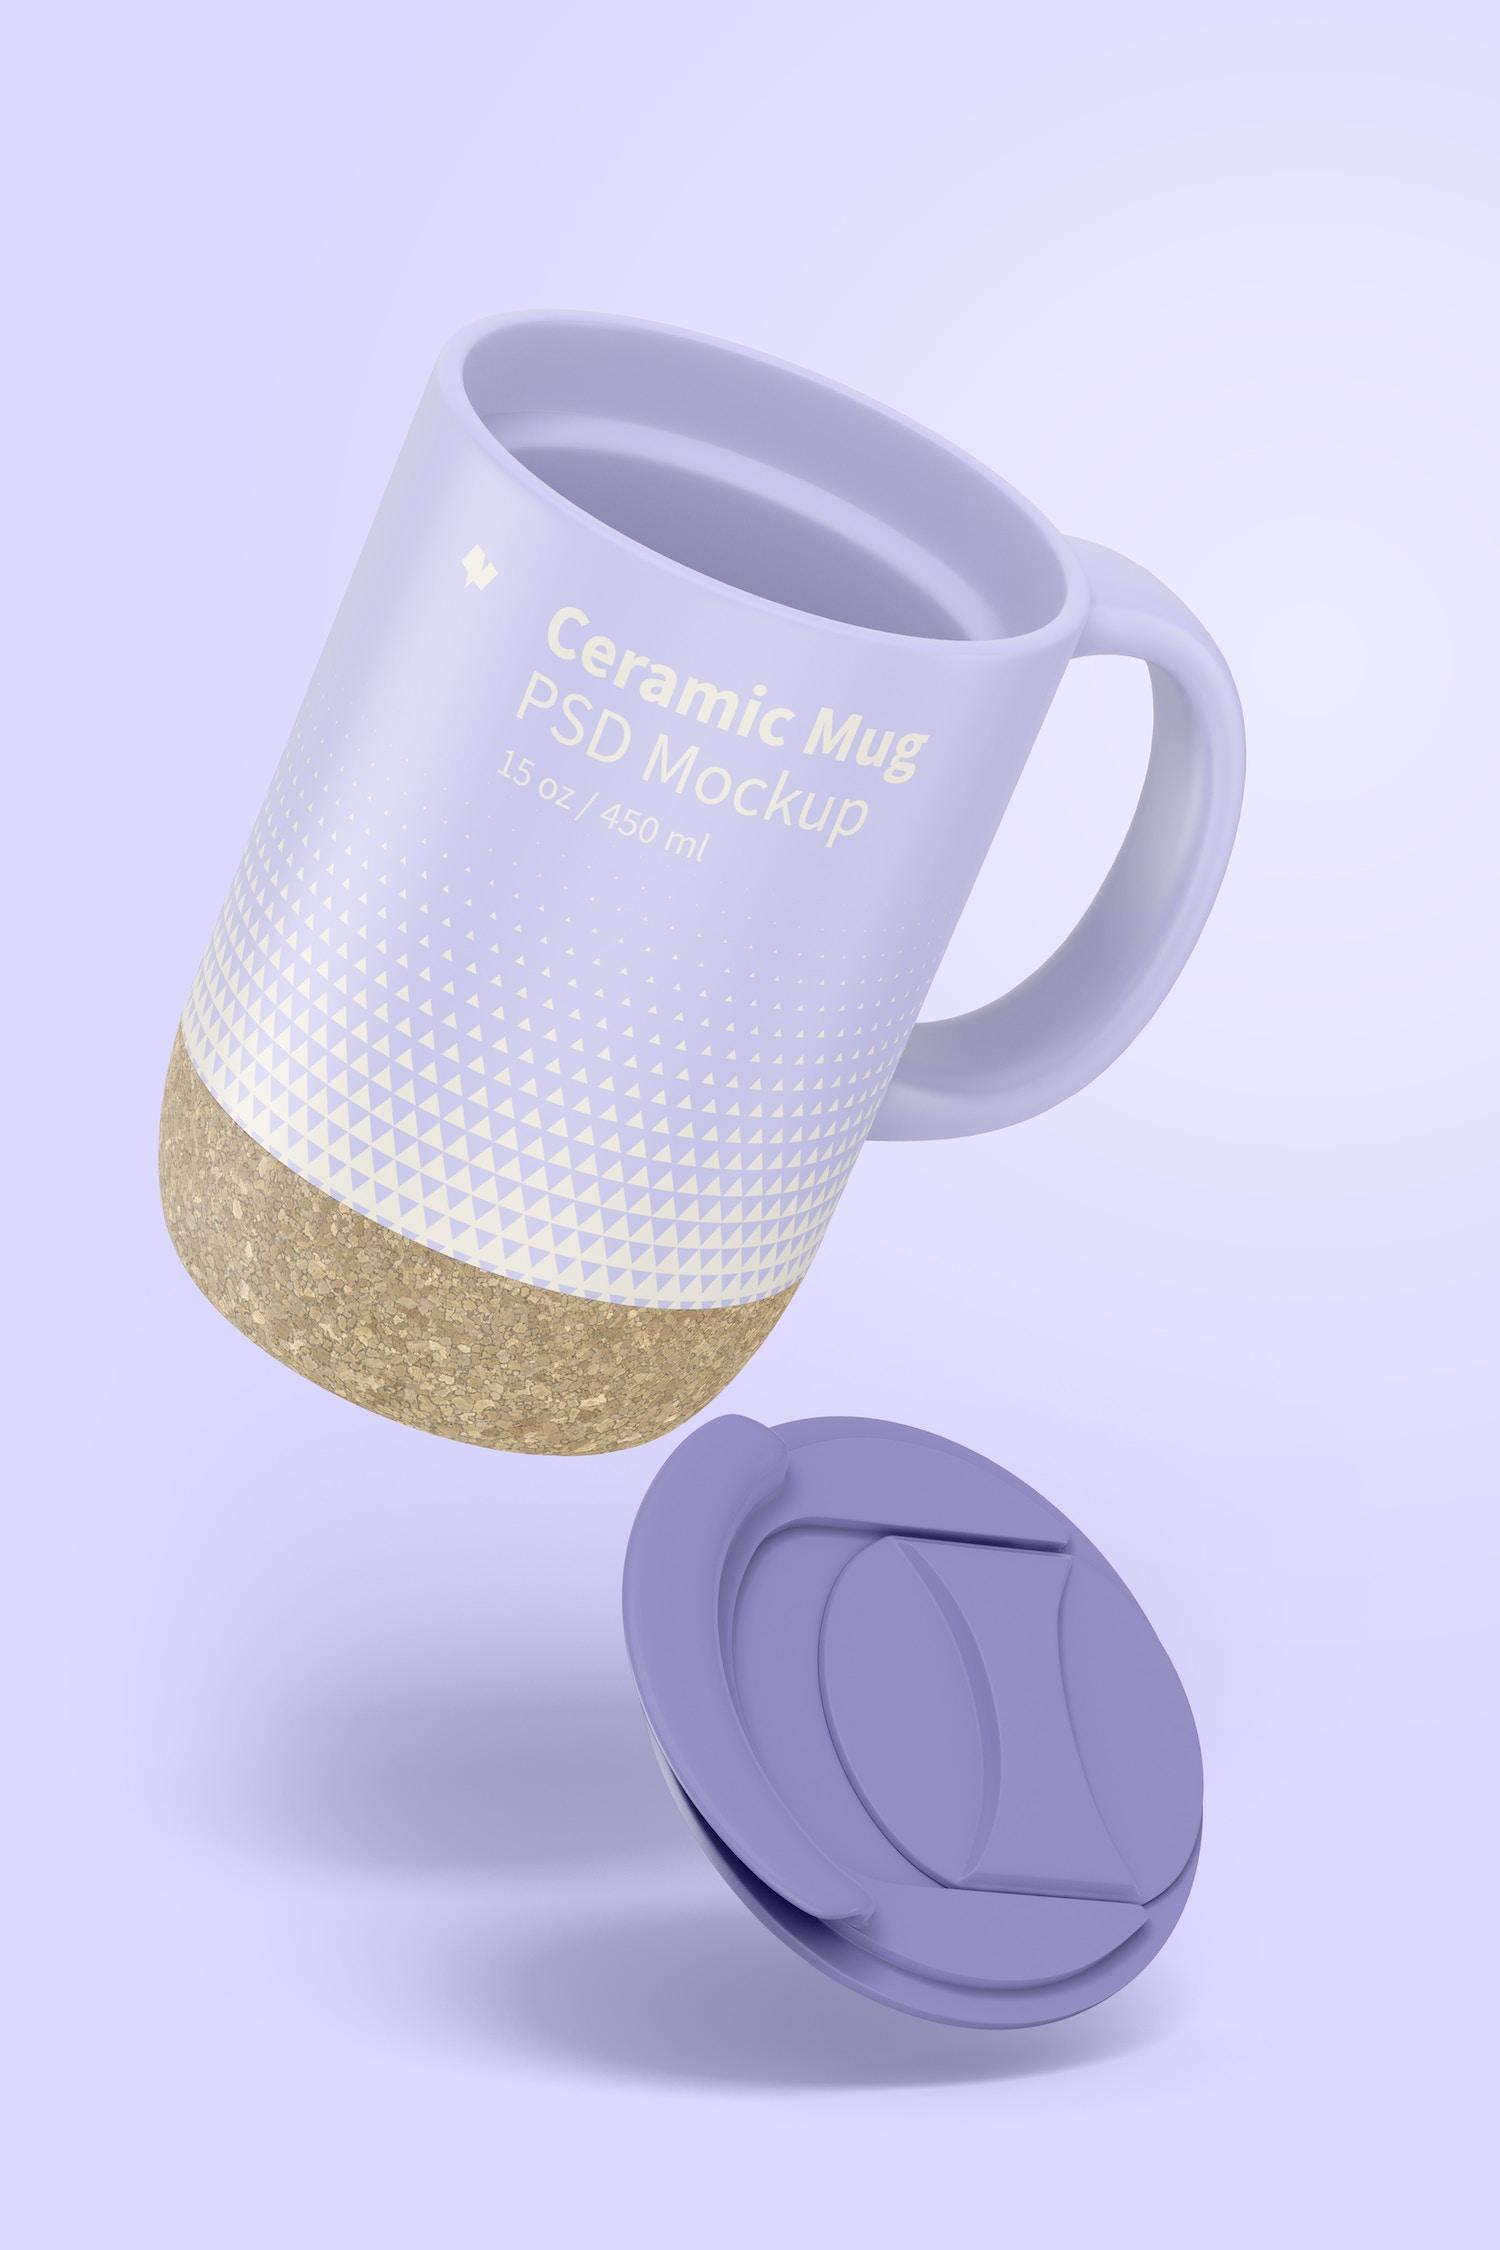 15 oz Ceramic Mug with Lid Mockup, Floating